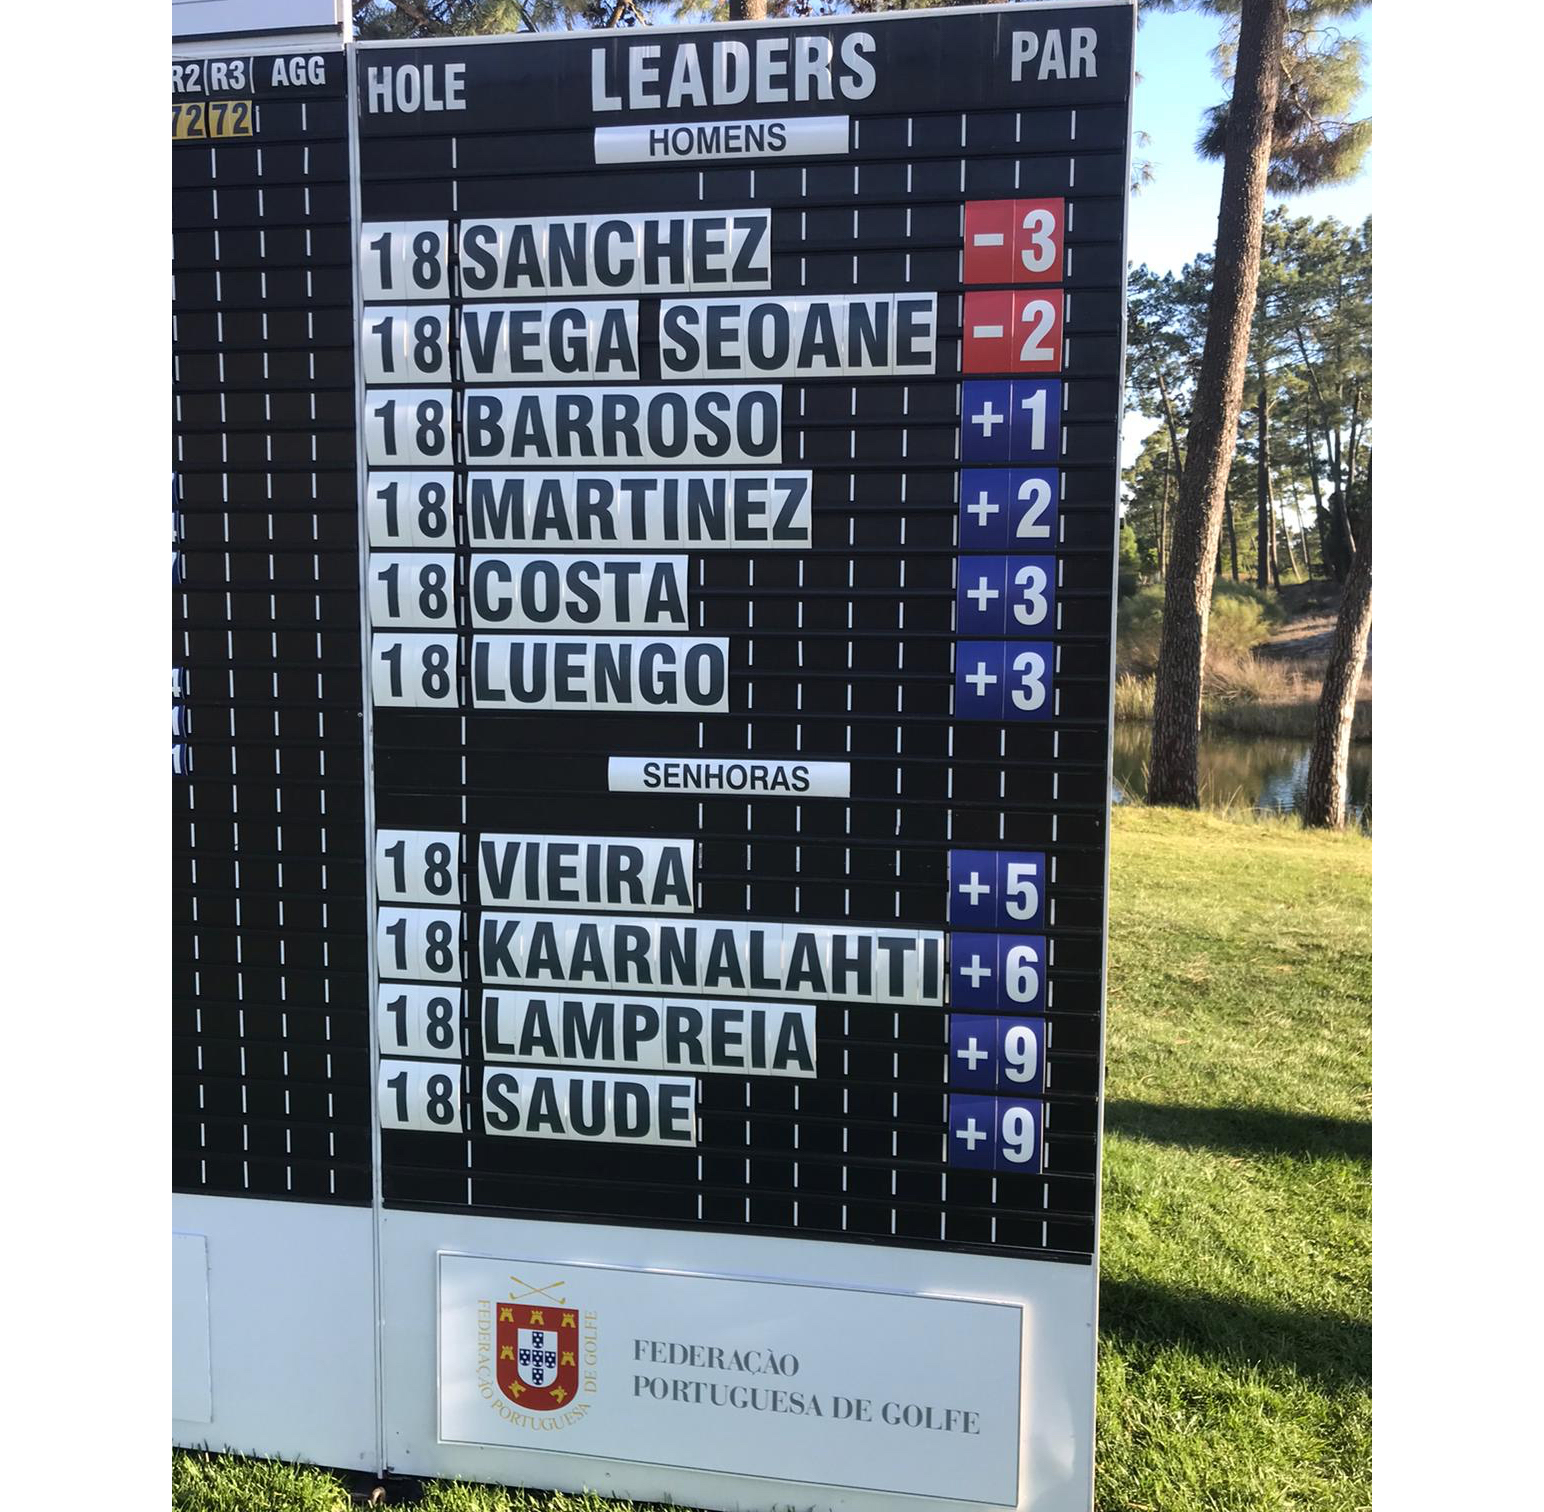 3rd Portuguese International Mid-Amateur Championship–OscarSanchezJubindoe LaraVieira líderesno arranque em Troia